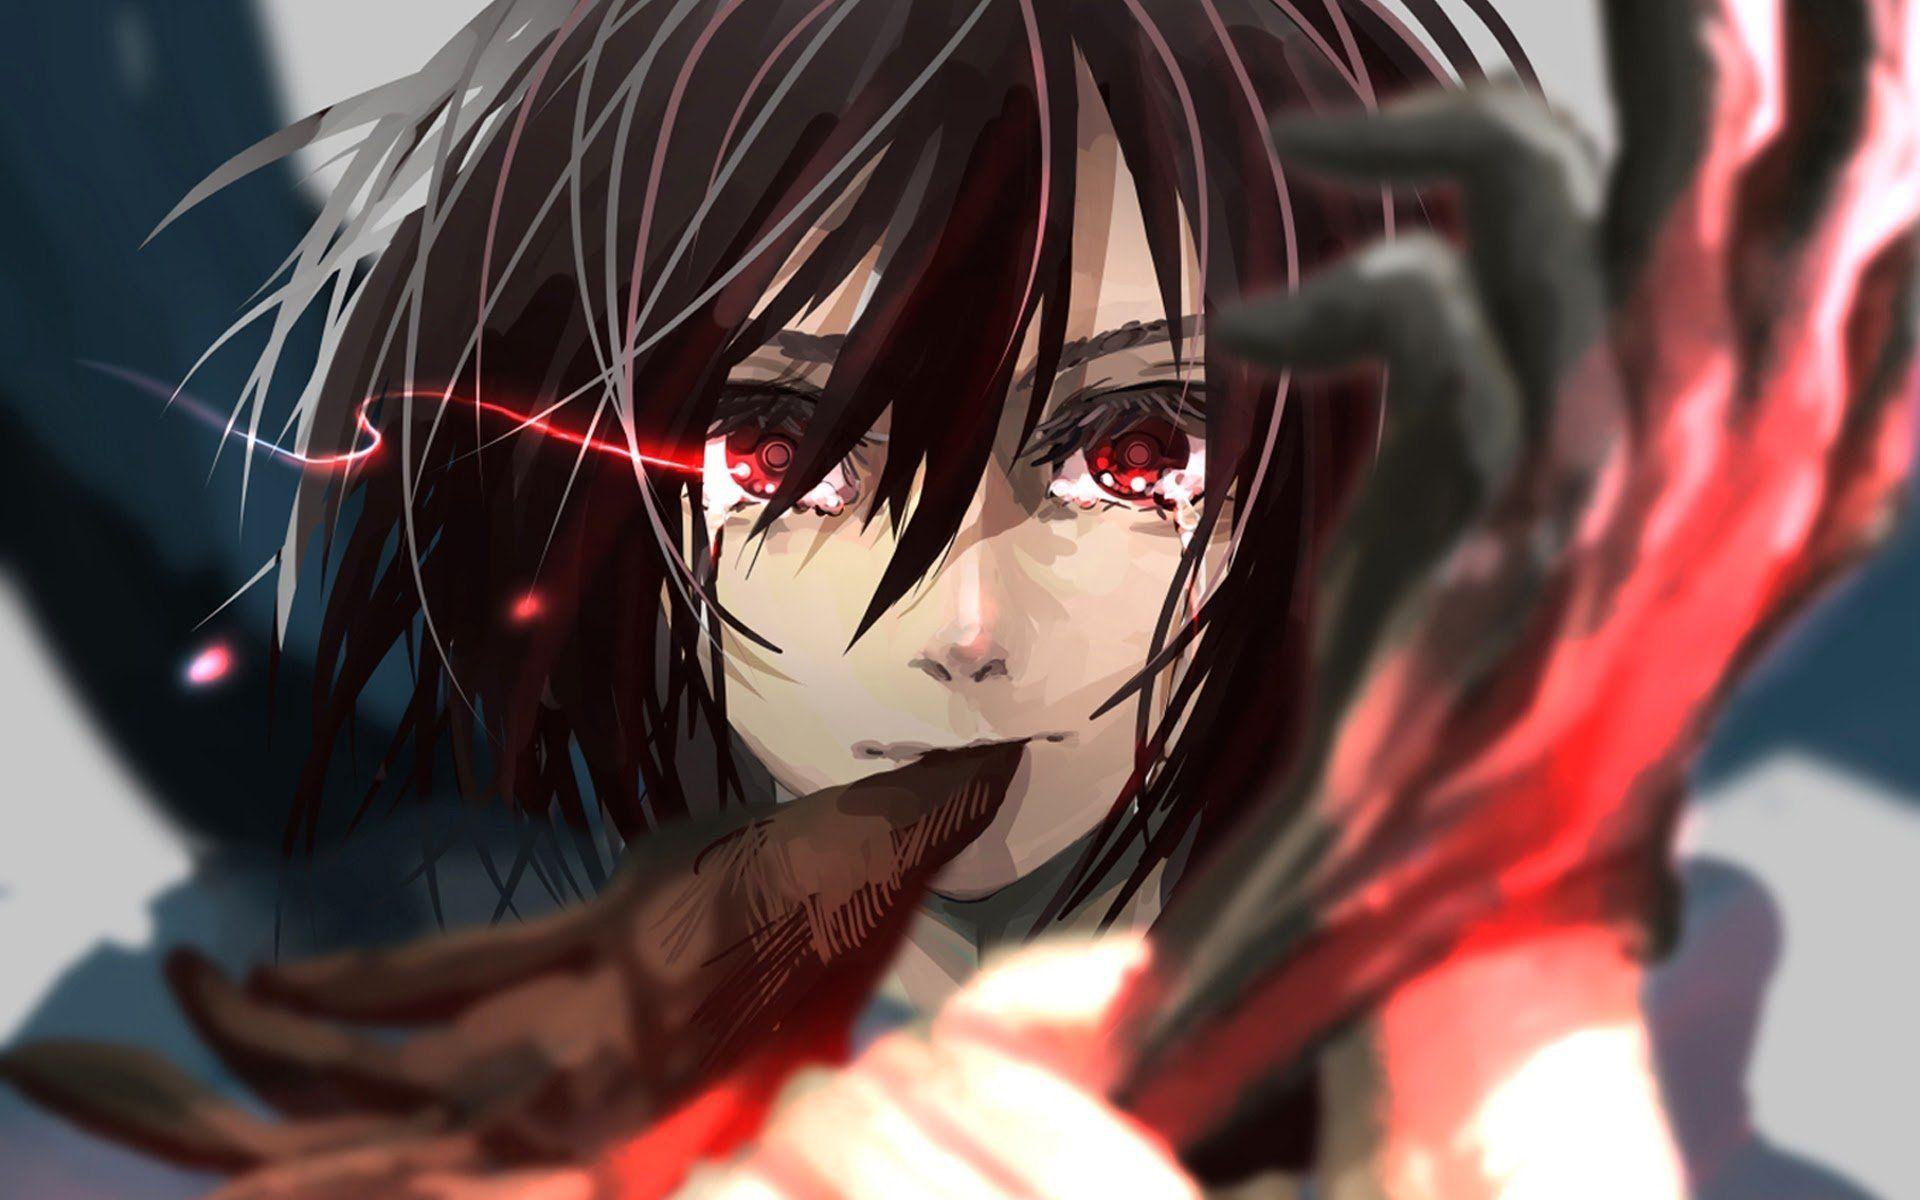 Anime Attack On Titan Mikasa Ackerman Wallpaper Attack